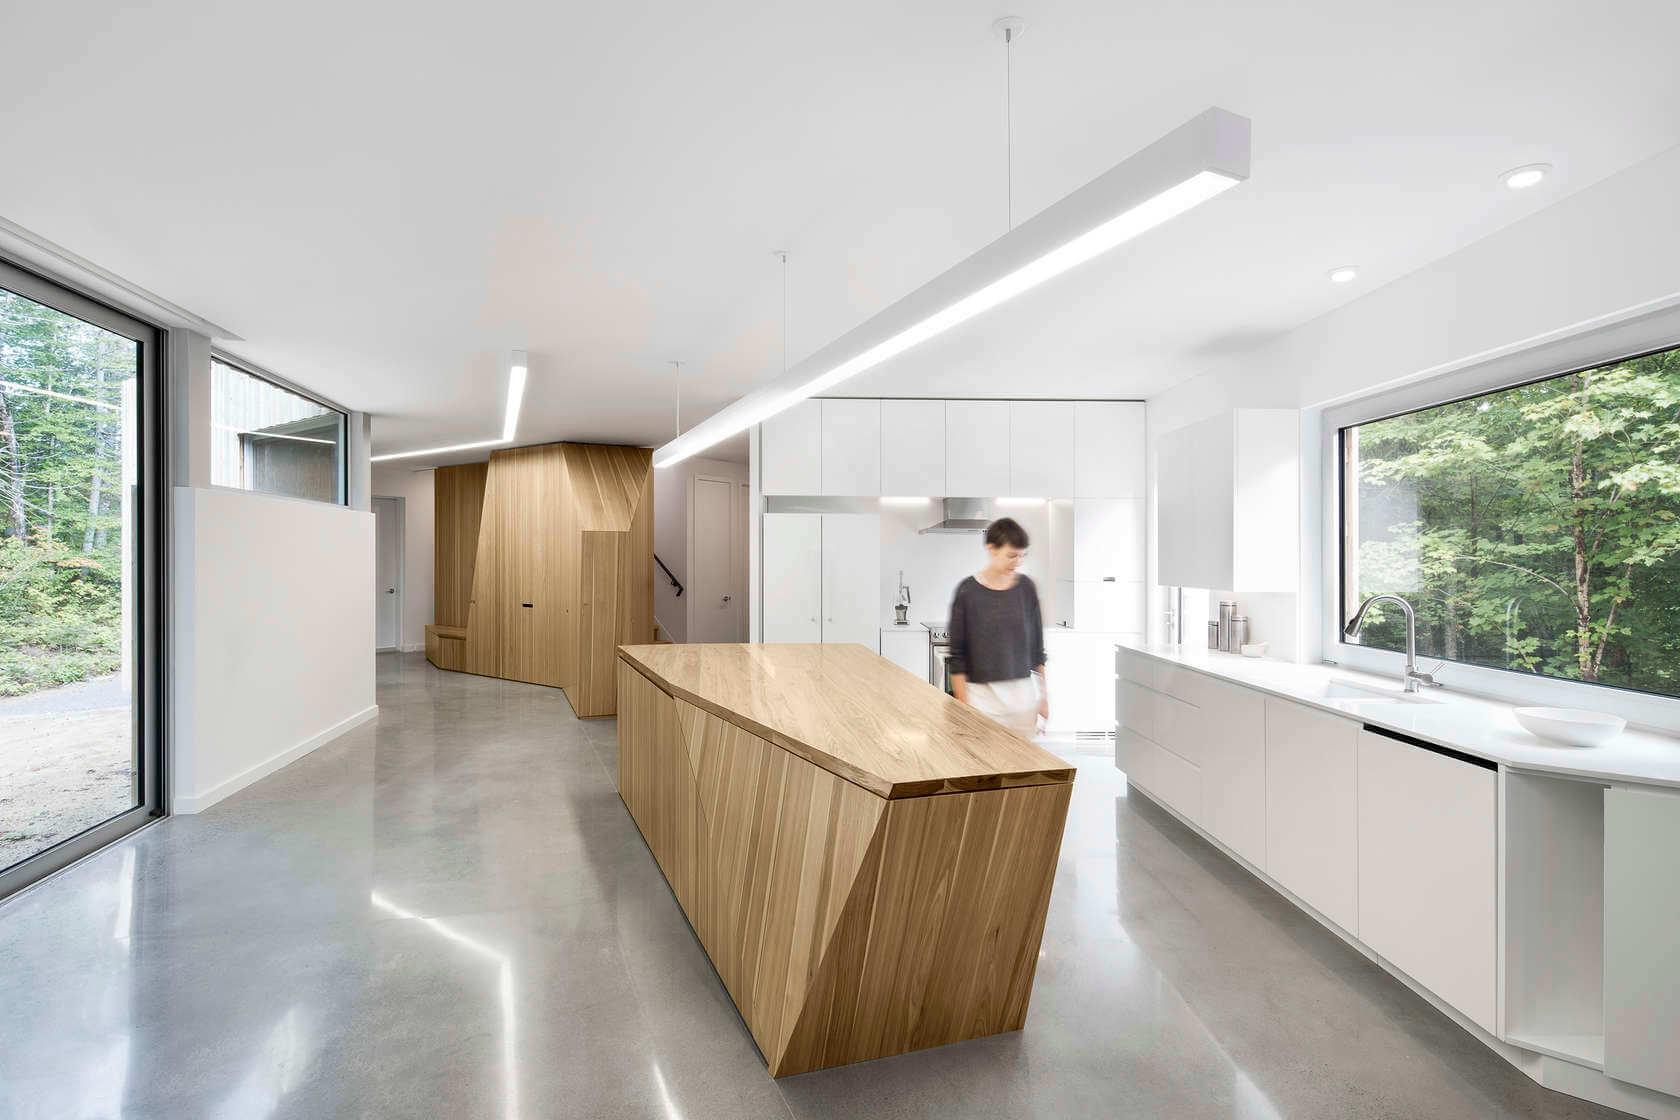 architecture_house_apartment_design_studia_interiors_osnovadesign_osnova_poltava_02